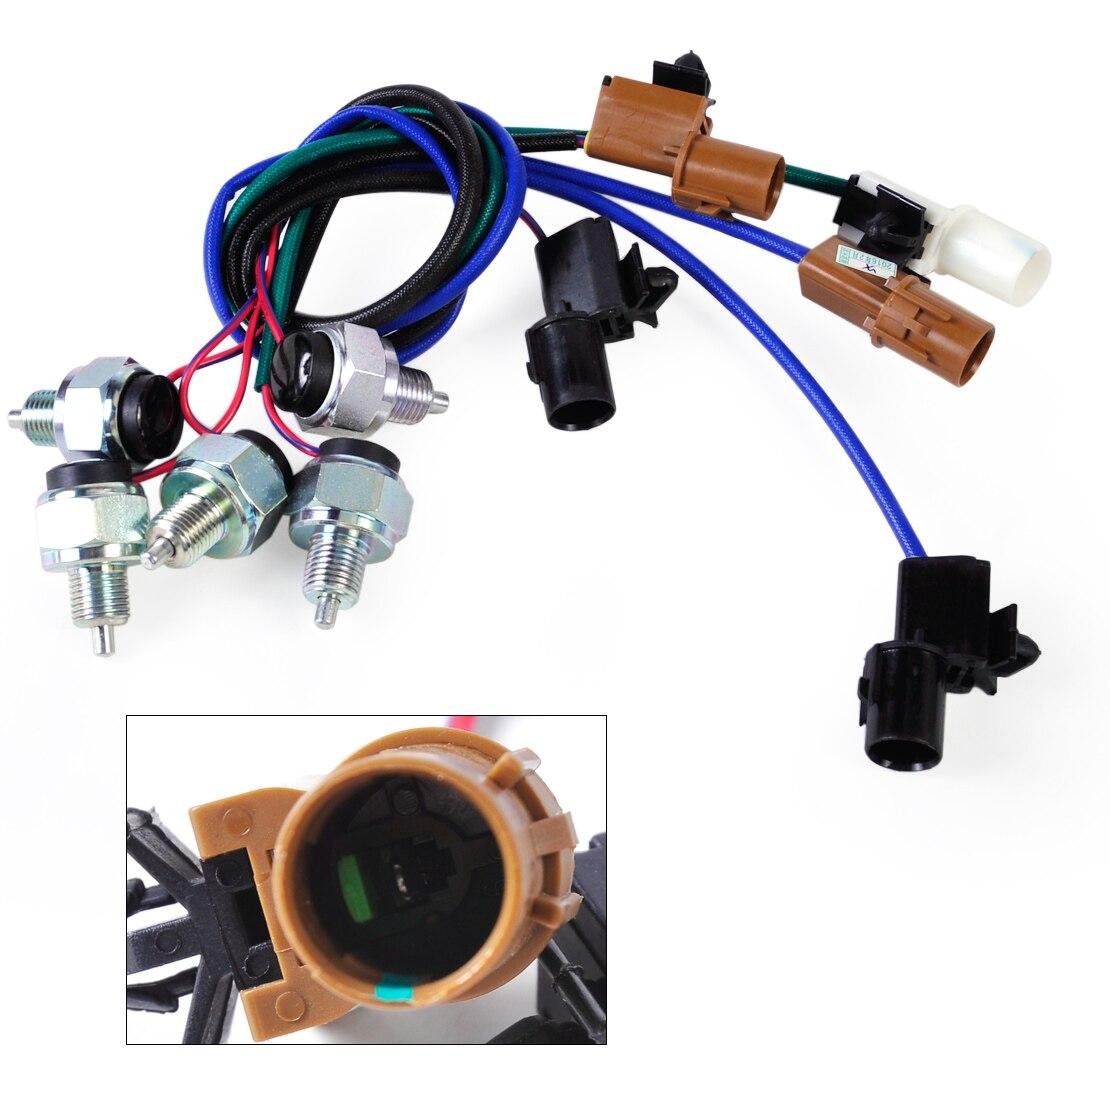 ФОТО One Kit 5pcsTransfer T F Case Switch MR580151 MR580152 MR580153 MR580154 MR580155 For Mitsubishi Montero Pajero 2003 2004 2005